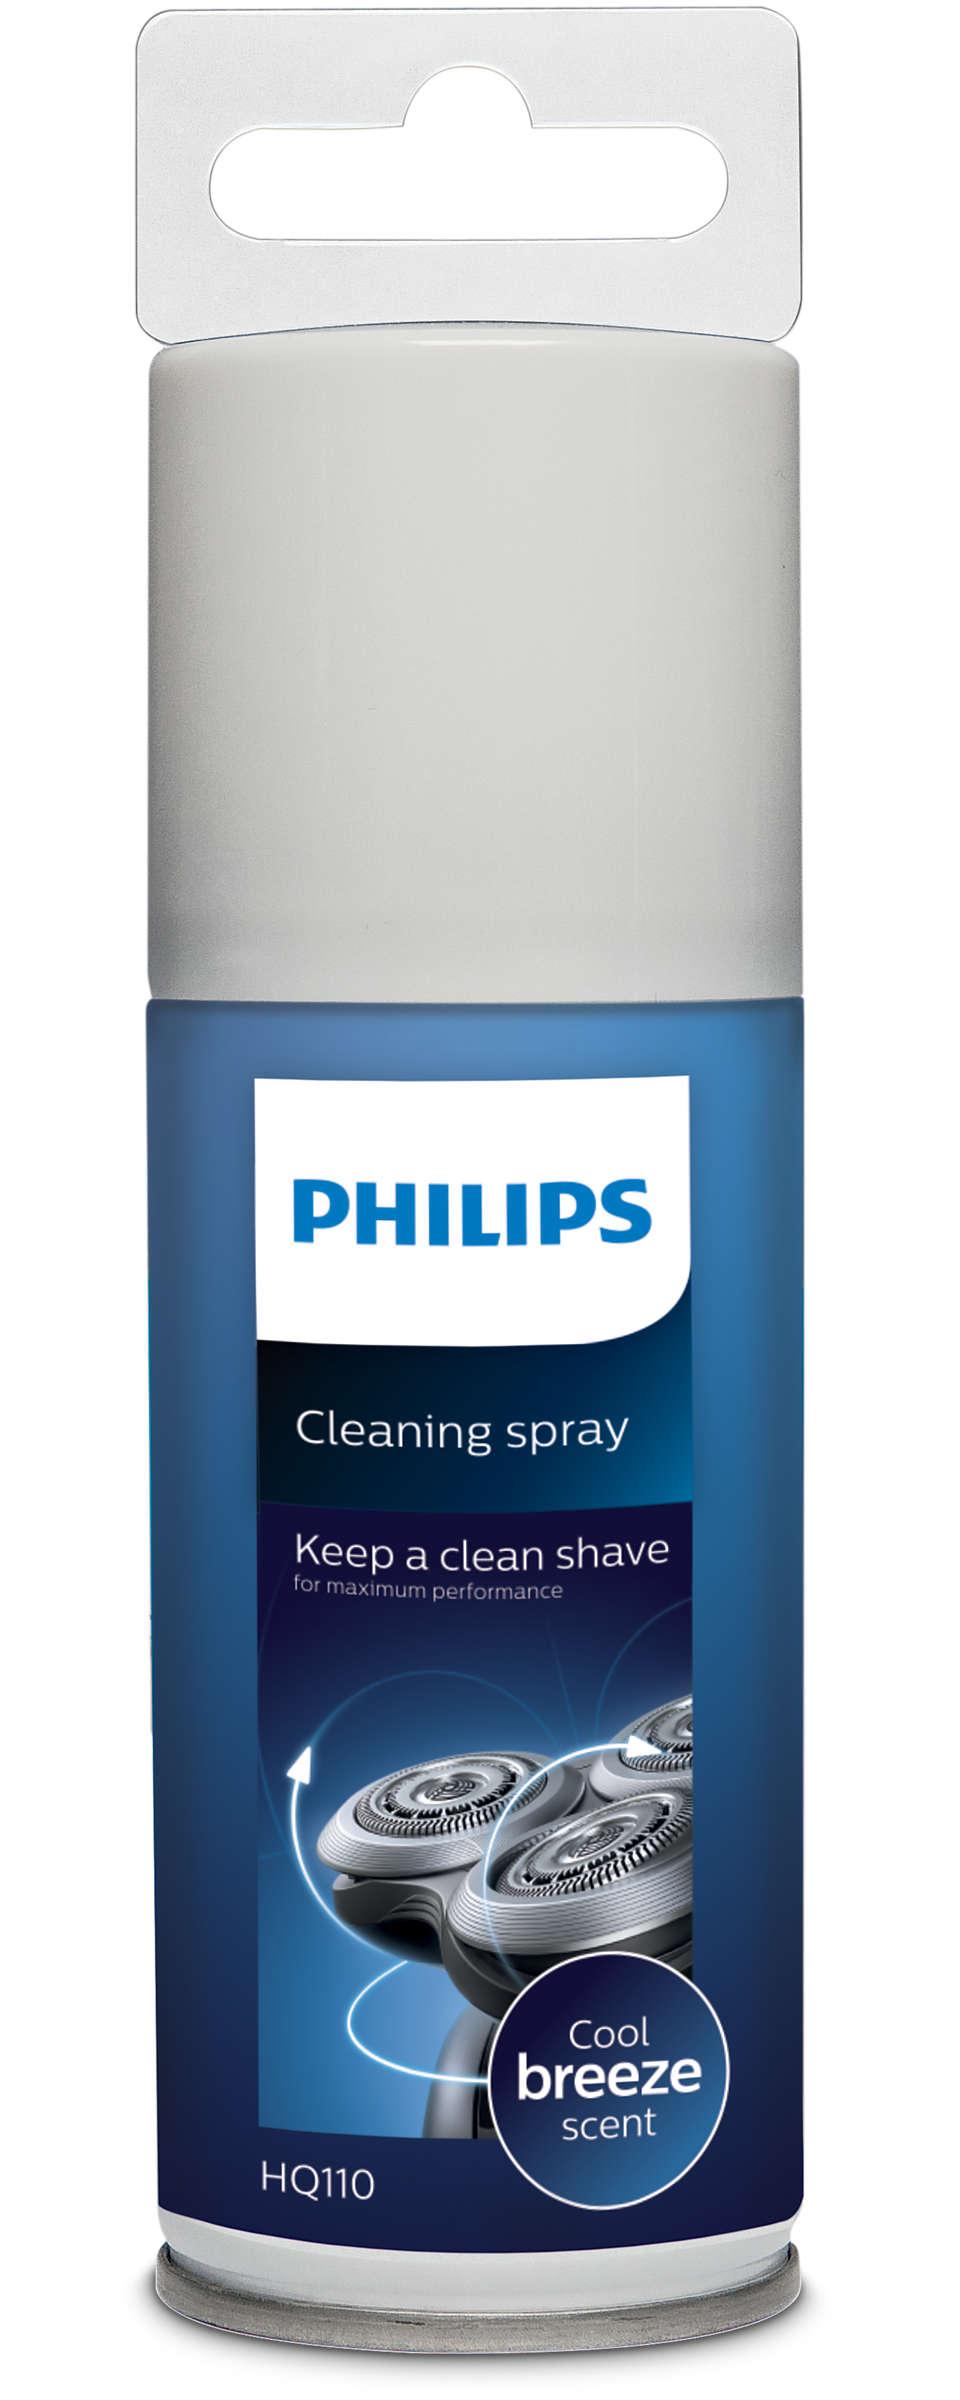 En ren barbering hver gang